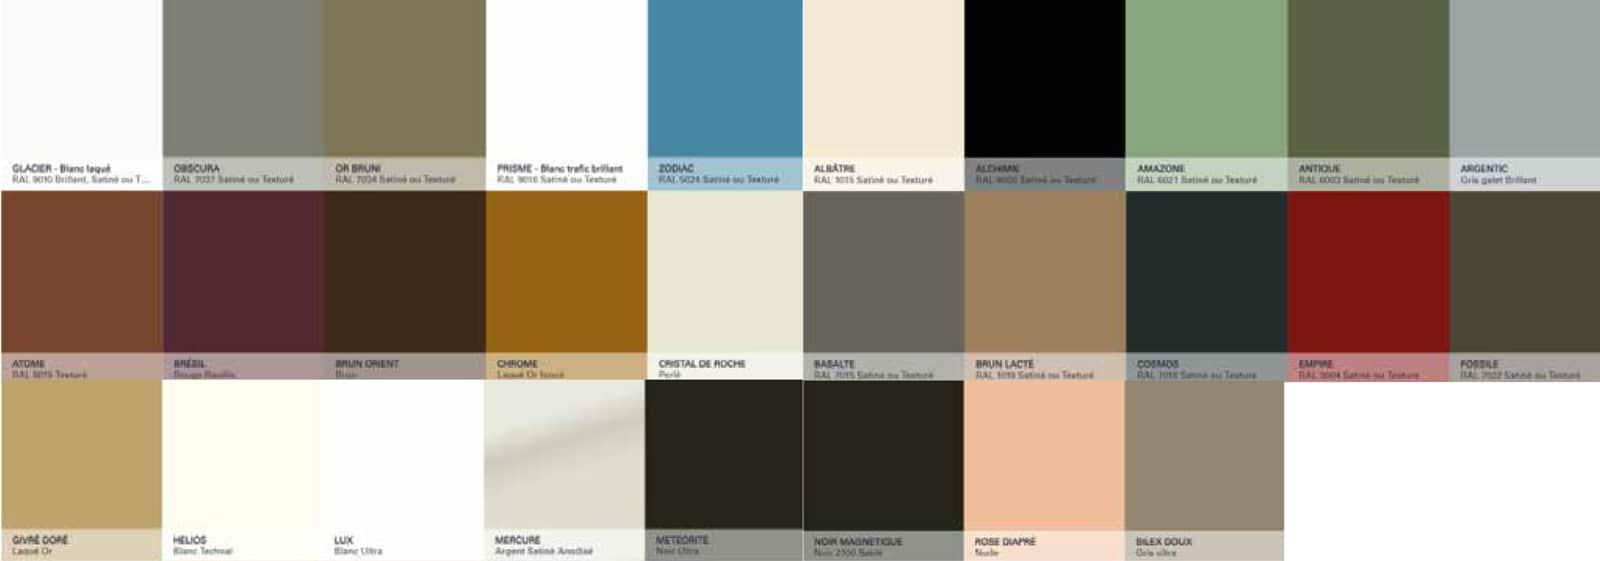 Menuiseries aluminium - les couleurs